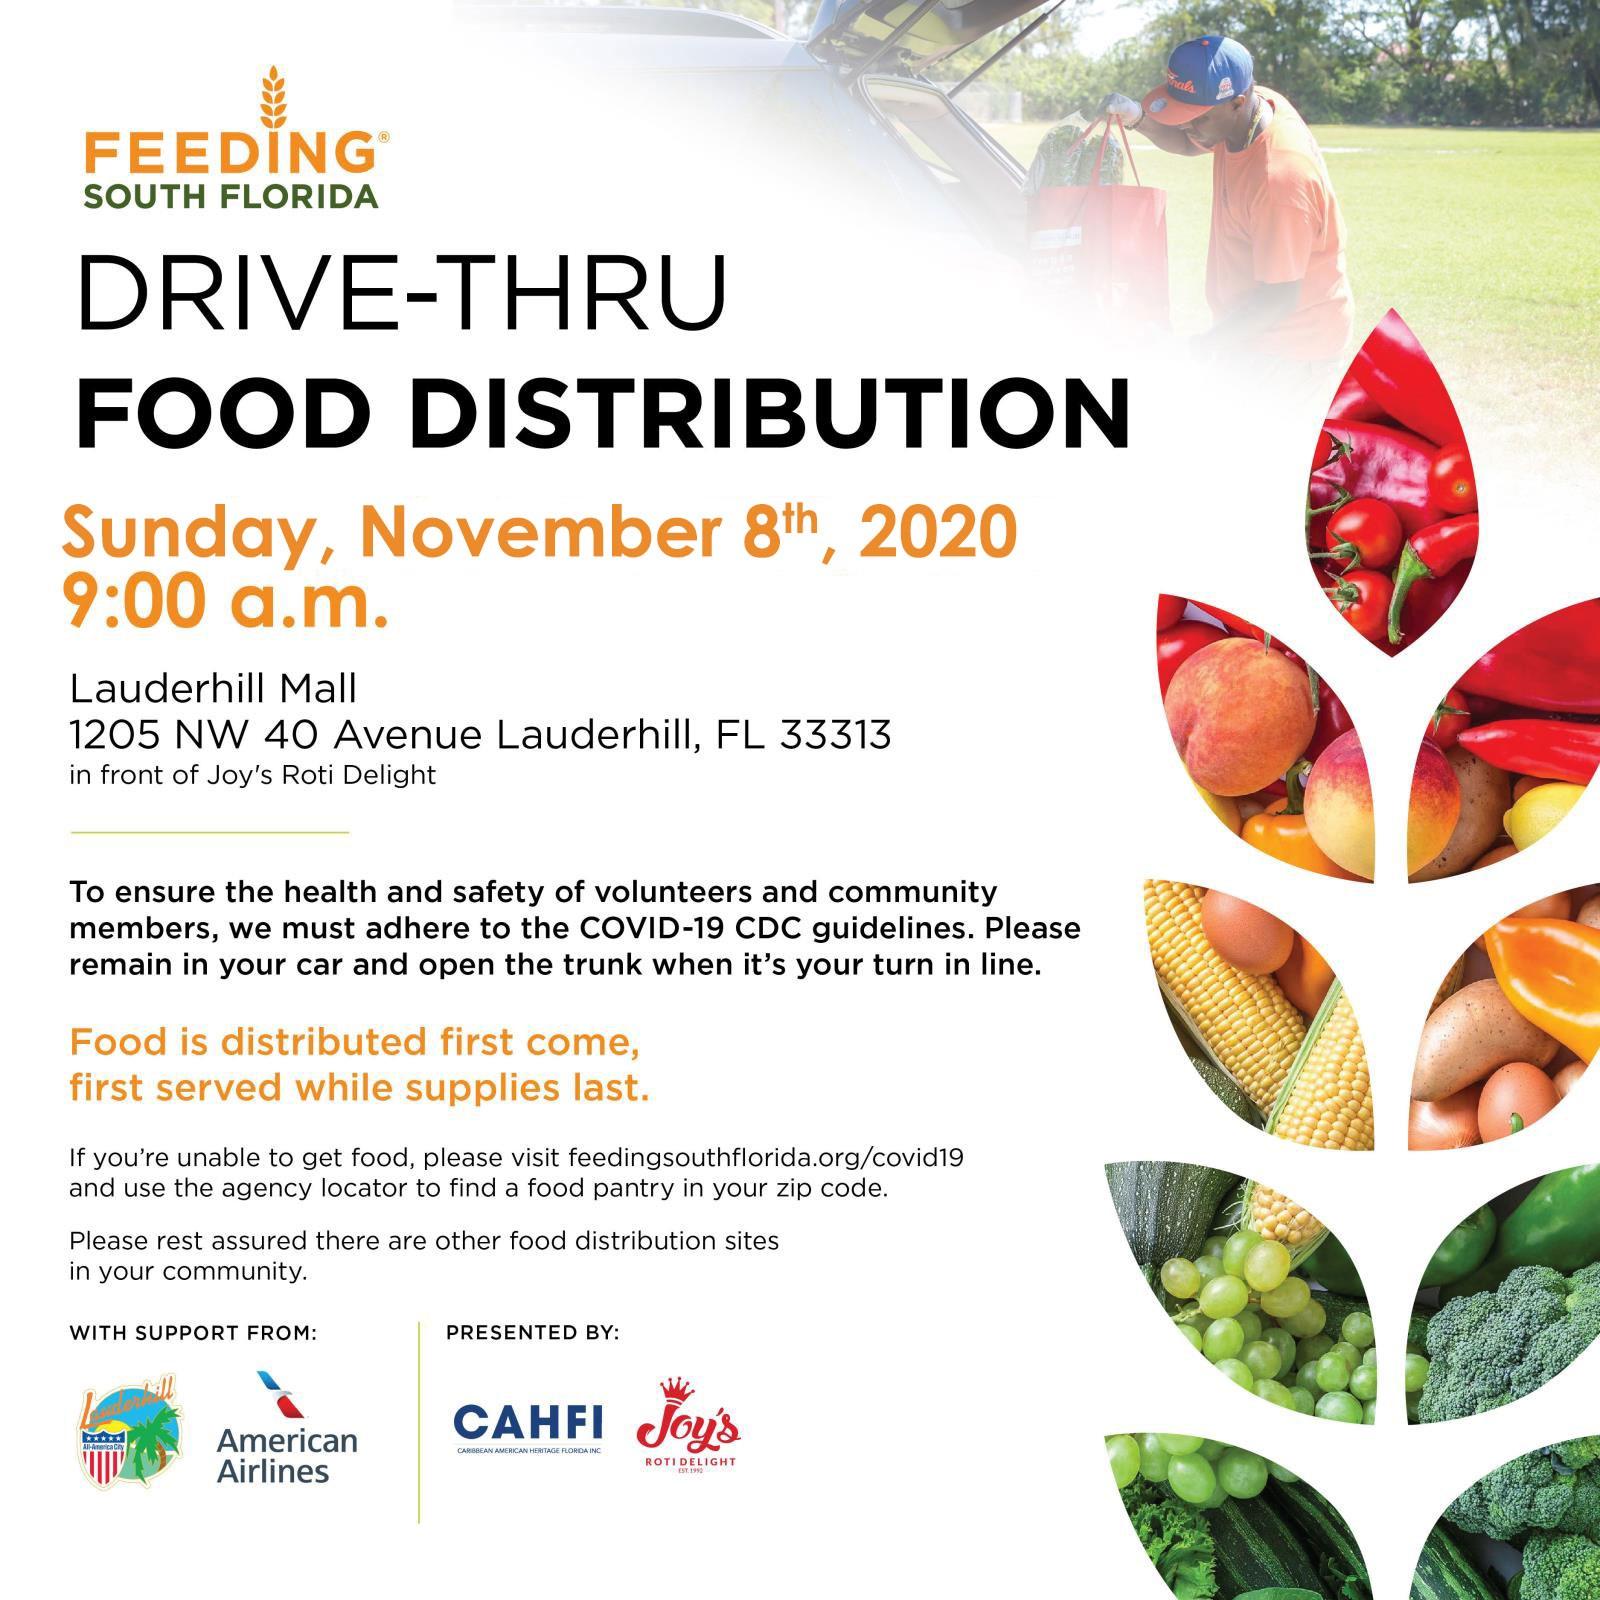 11-8-20 - COVID-19 Drive-Thru Food Distribution - Joy''s Roti Event Flyer